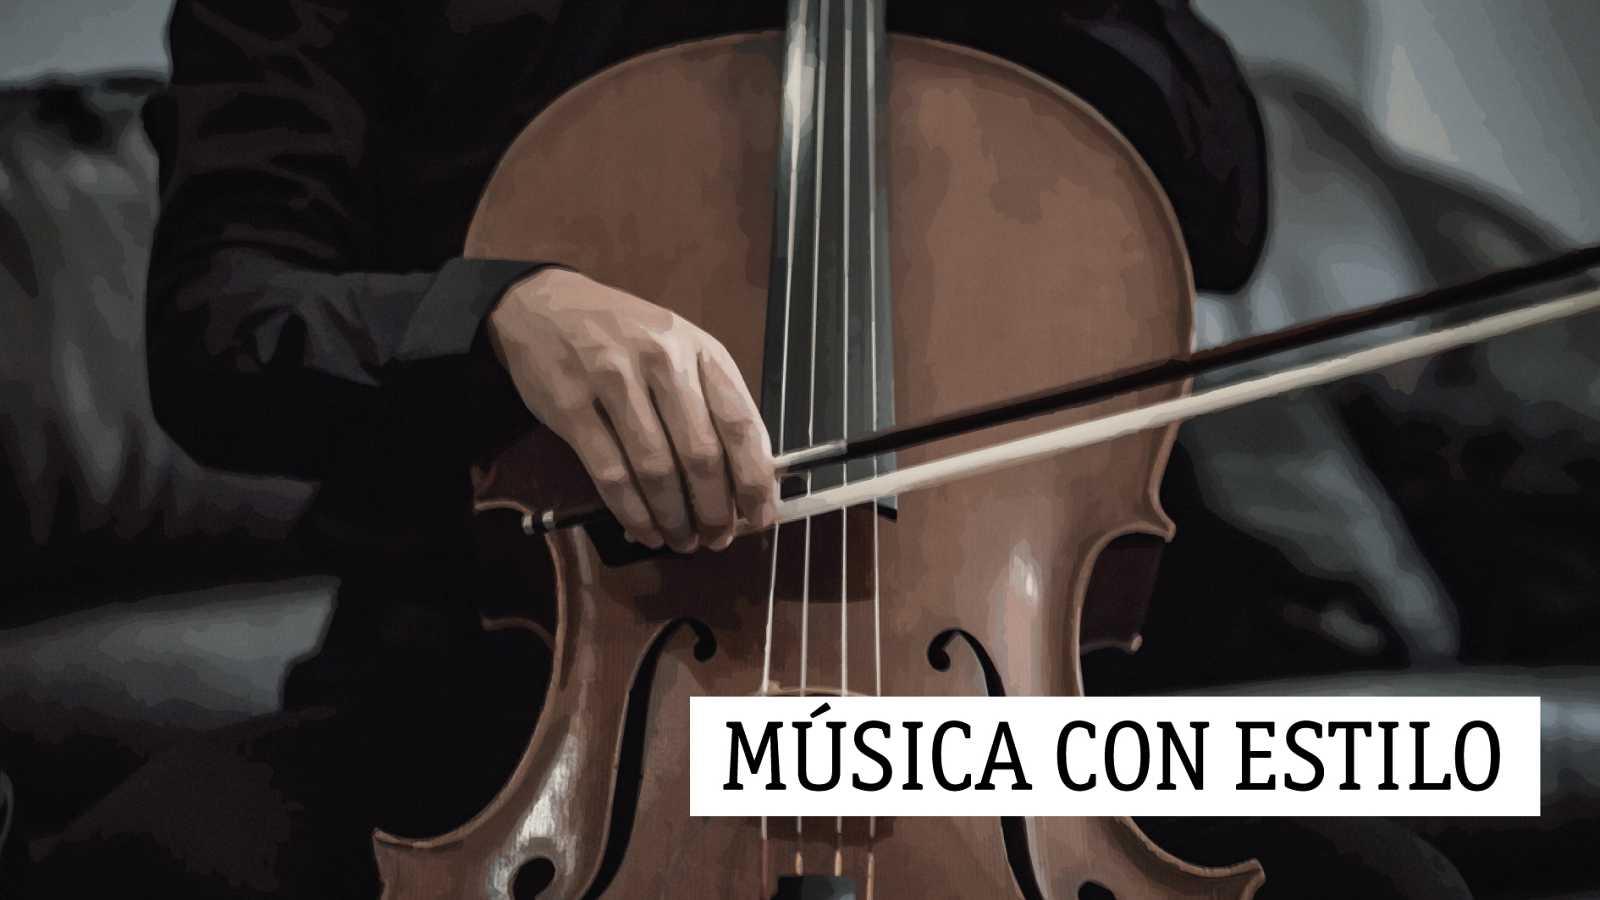 Música con estilo - Danzas del Corpus Christi - 22/09/19 - escuchar ahora